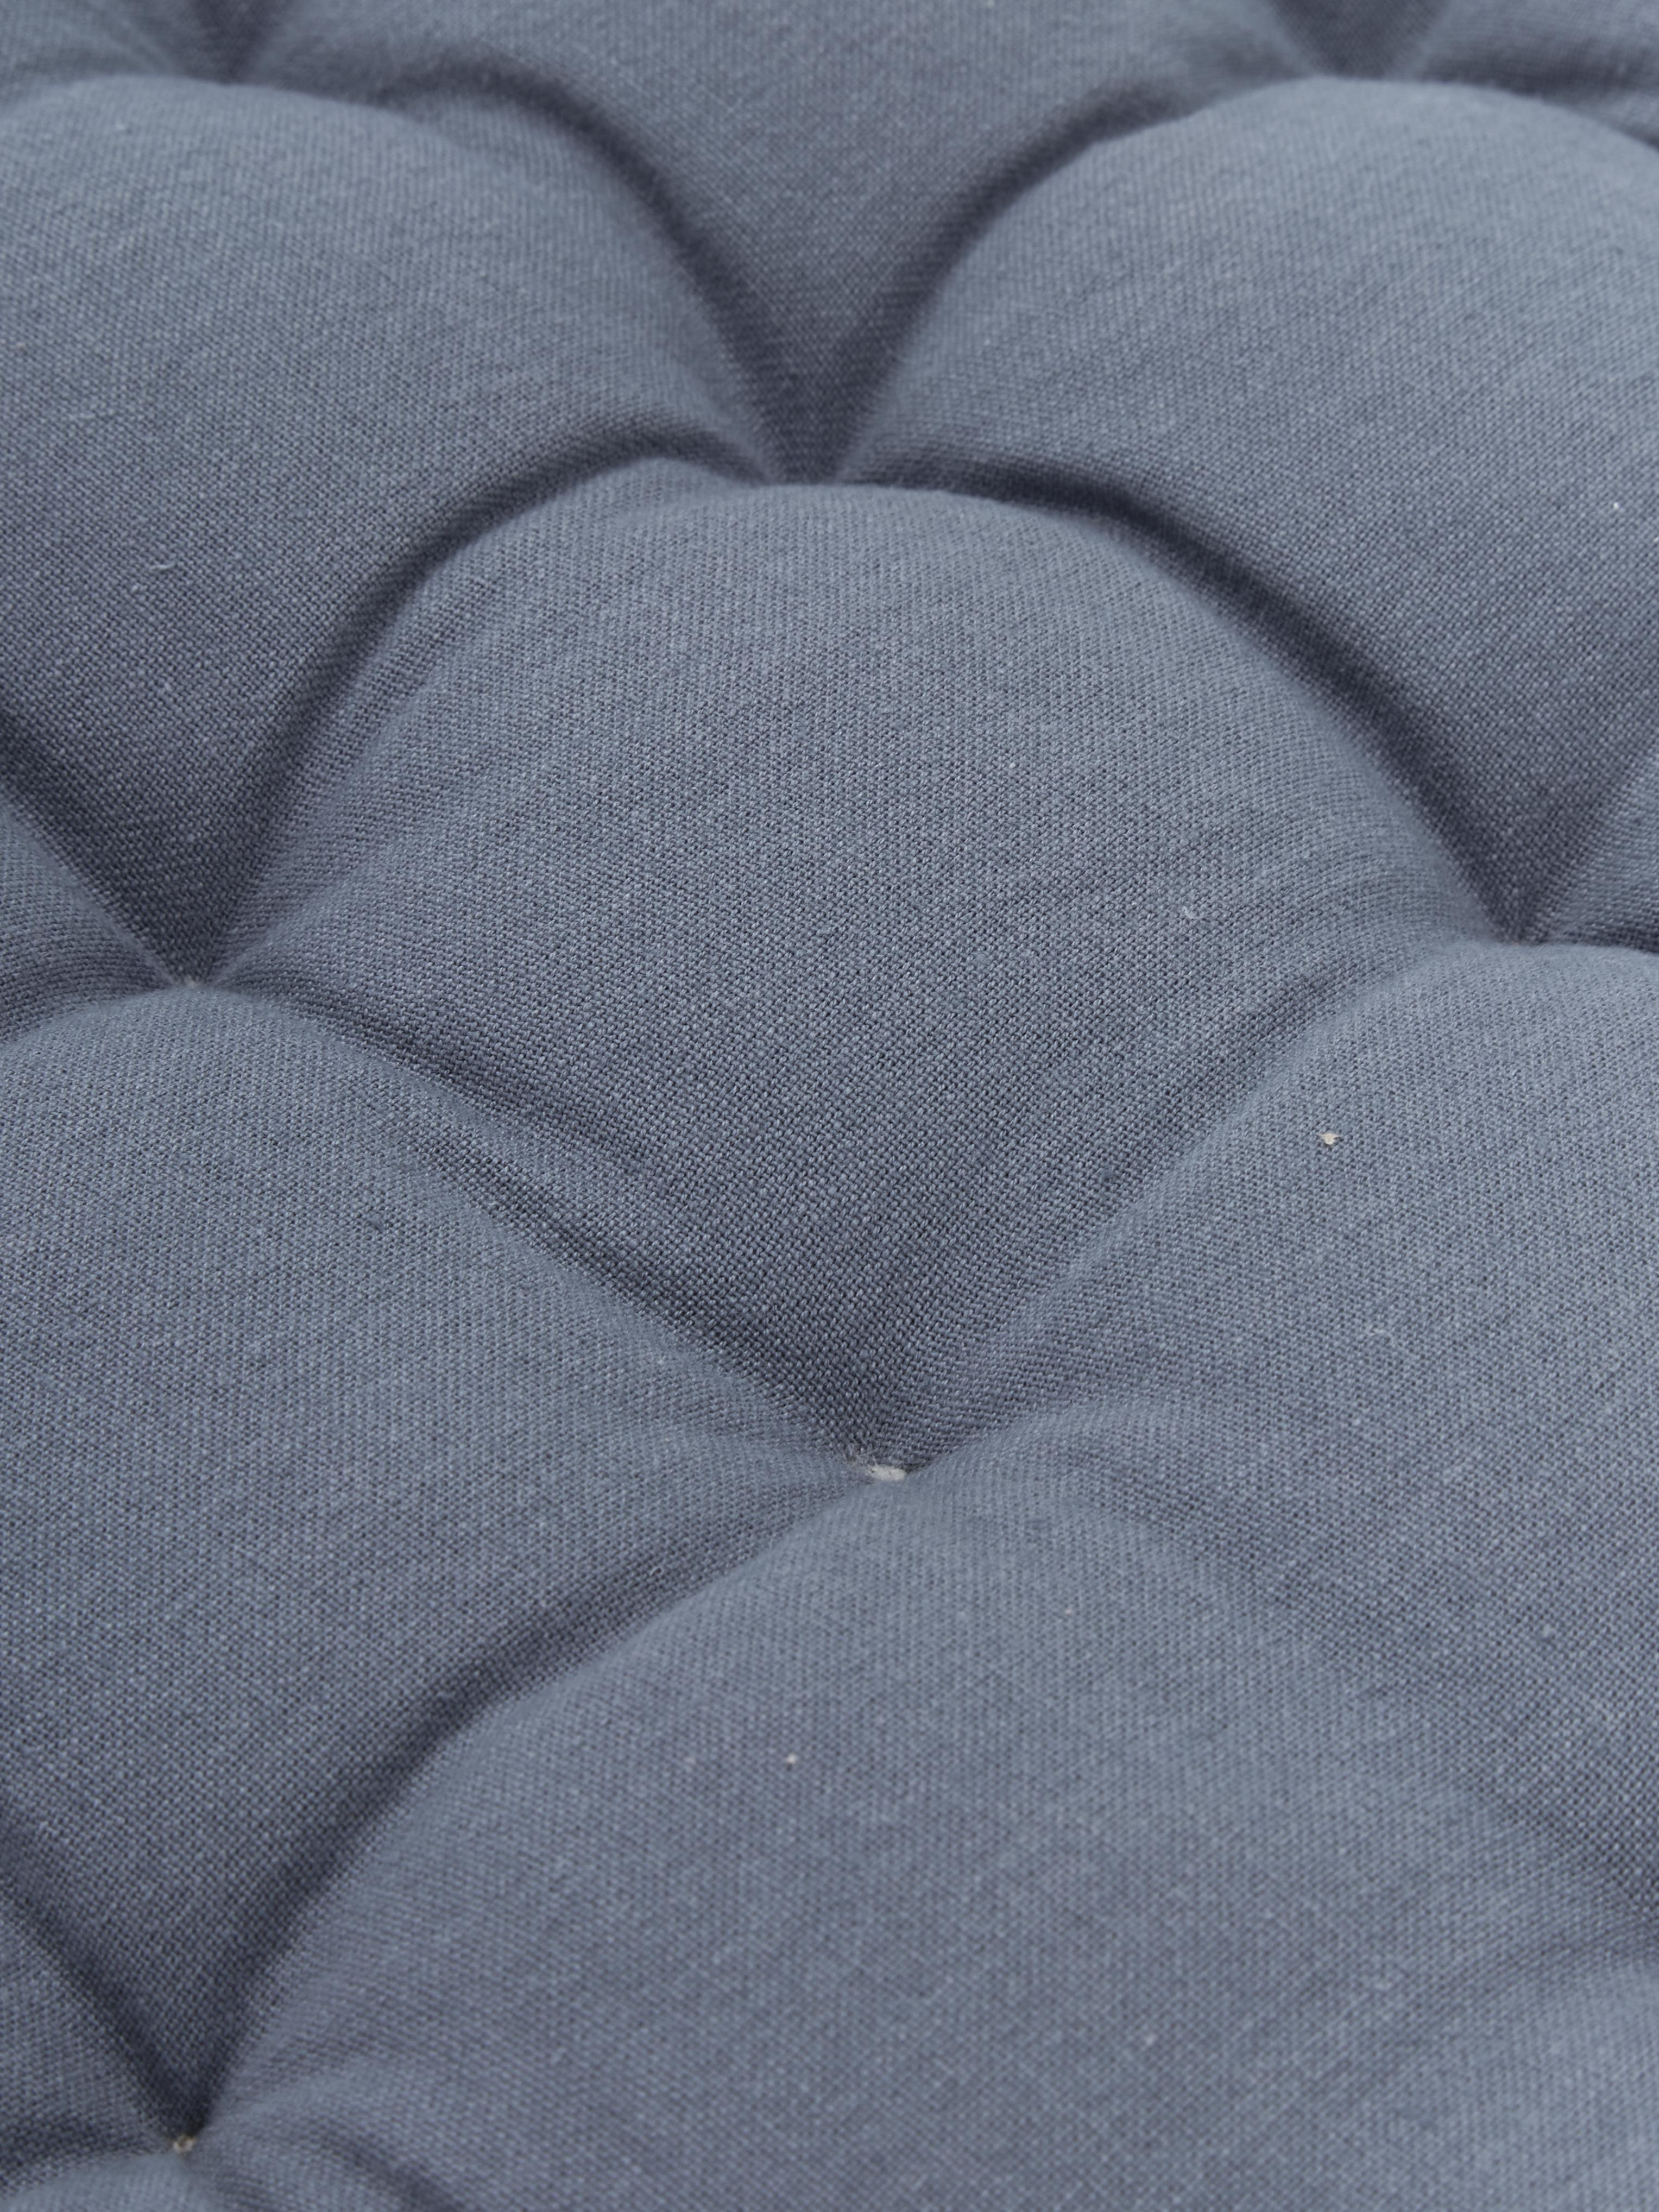 Bankauflage Gavema, Blau, 40 x 120 cm